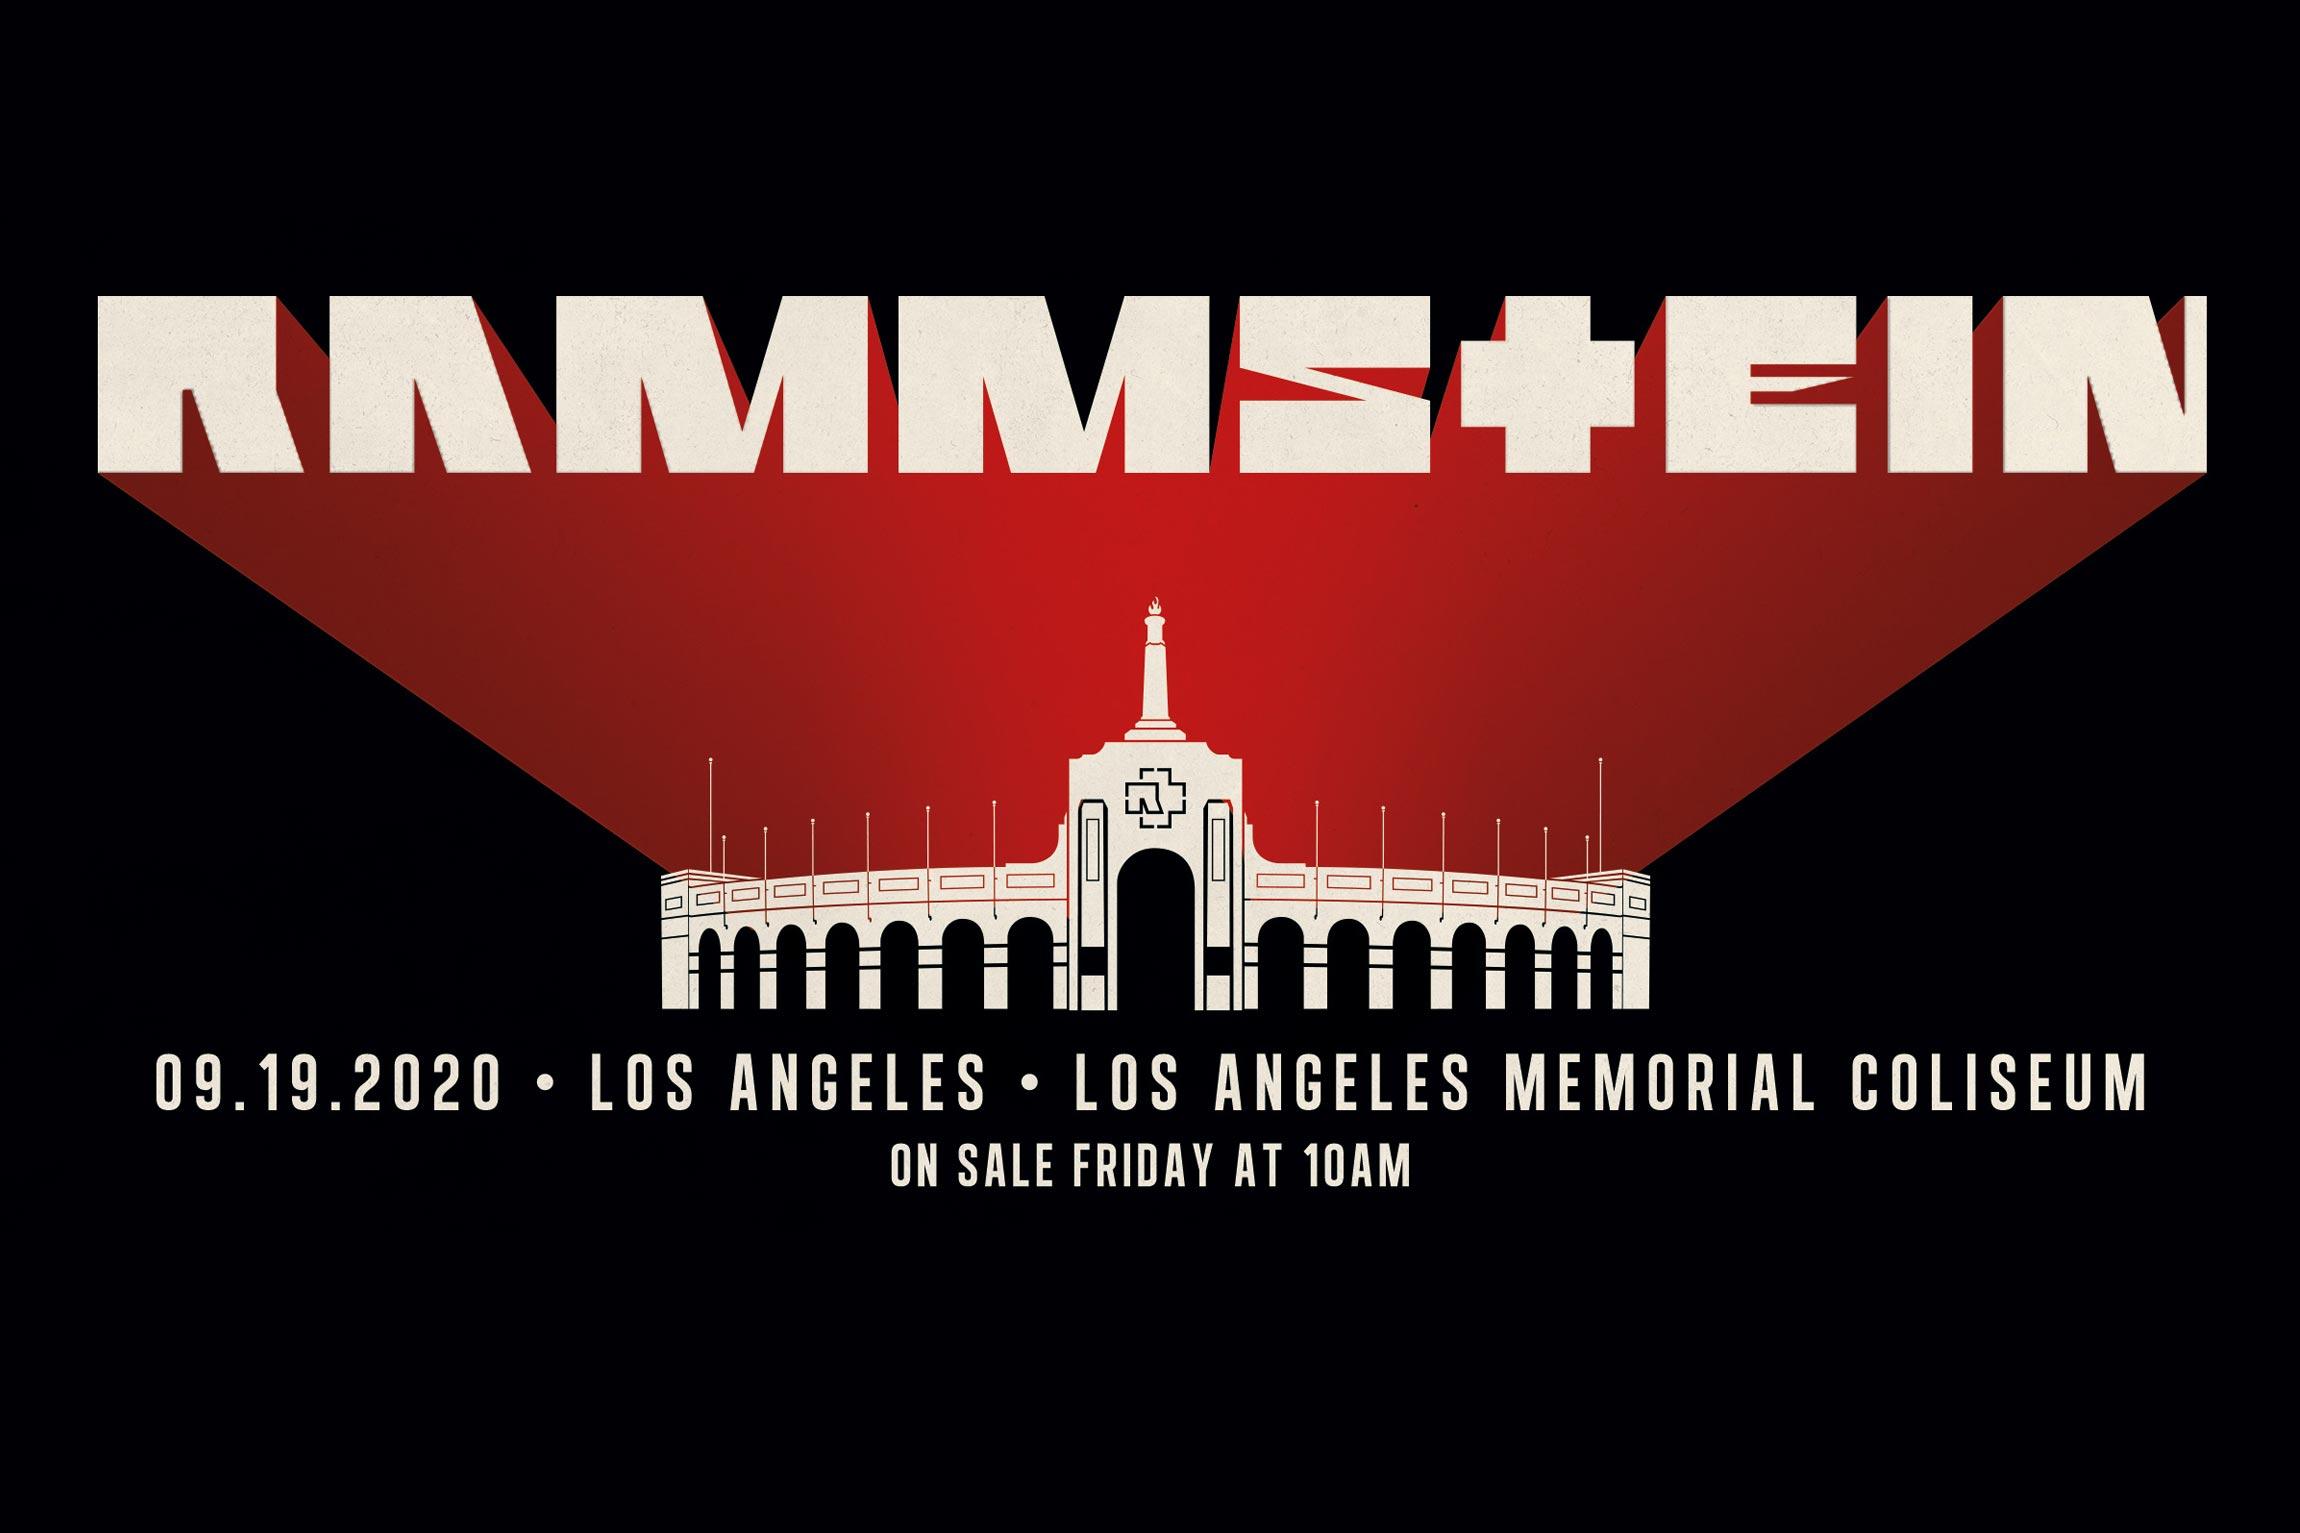 Rammstein Press Release